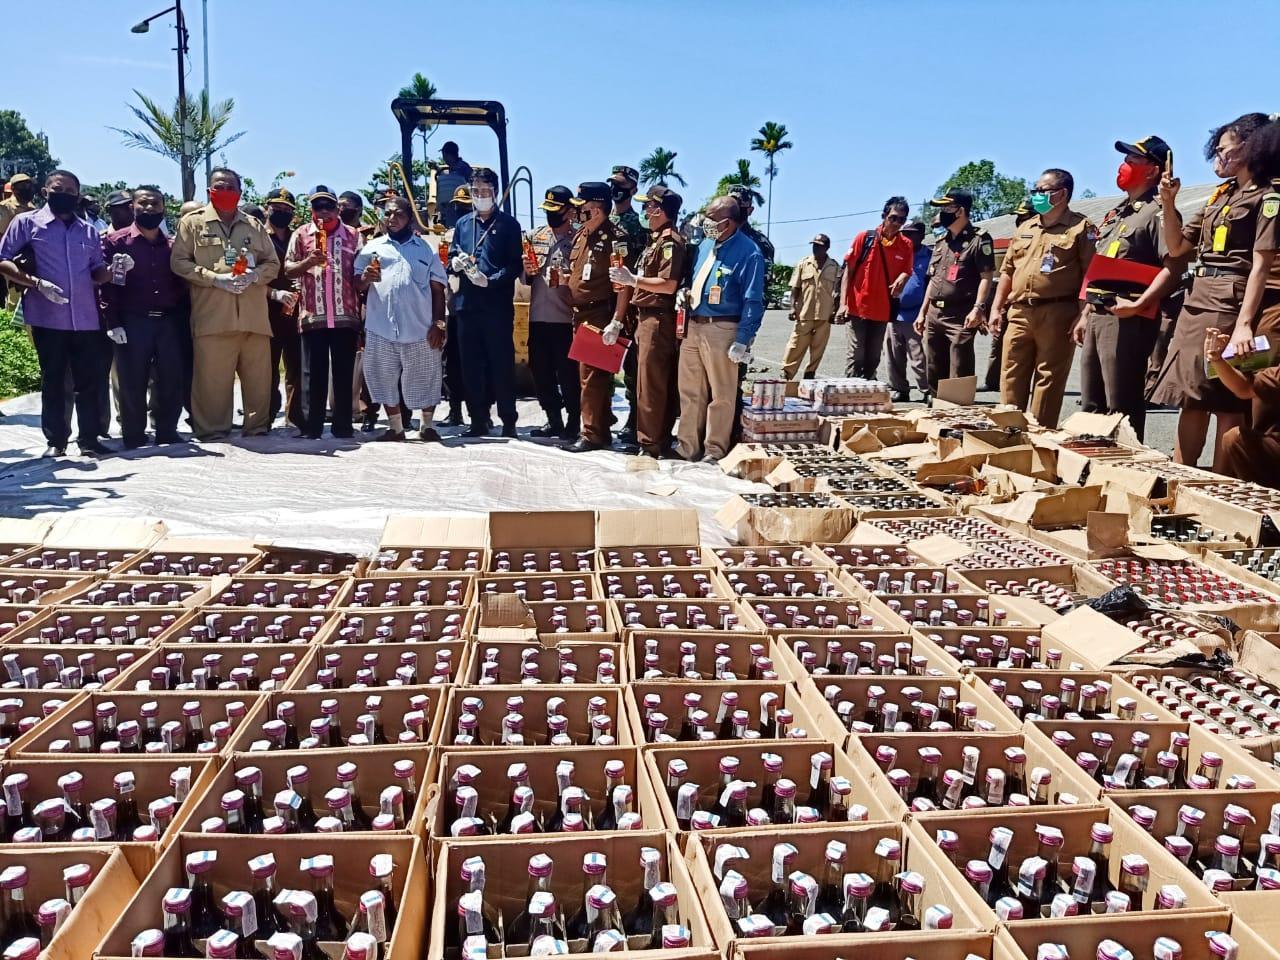 Kejati Papua Barat Musnahkan 4.041 Botol Miras Dan Belasan Bungkus Ganja 25 IMG 20200720 WA0038